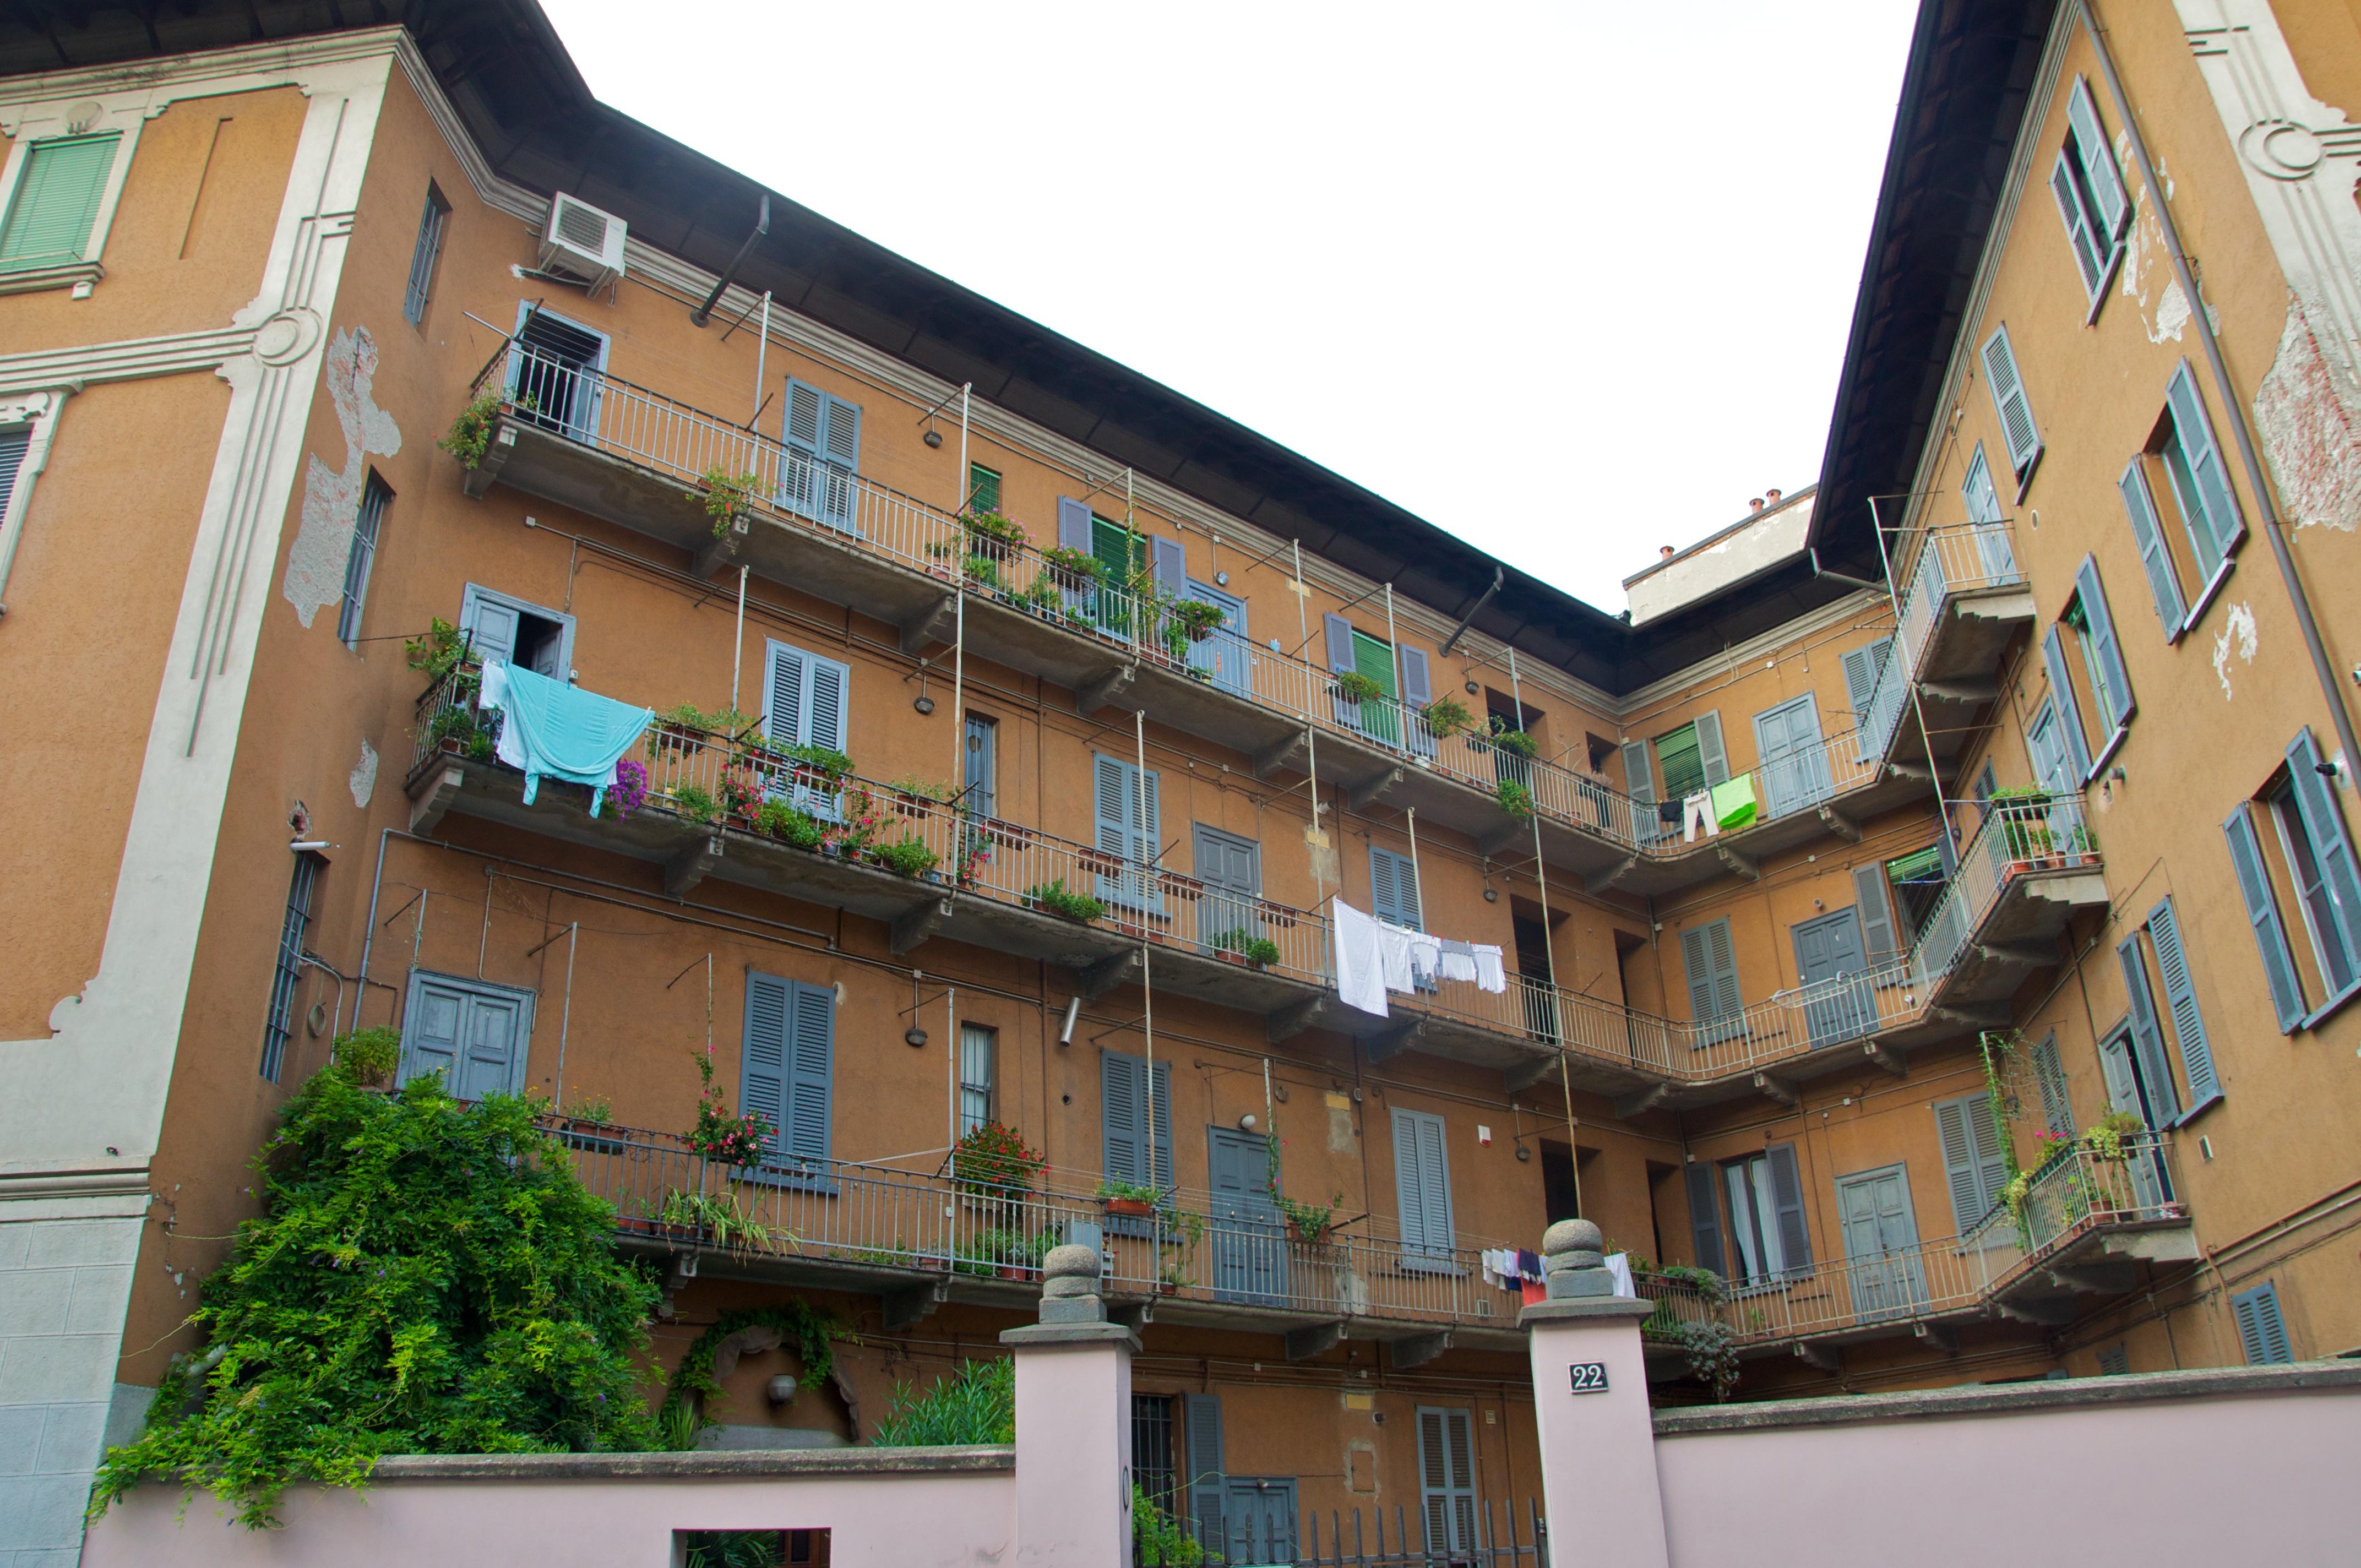 Captivating Case Di Ringhiera